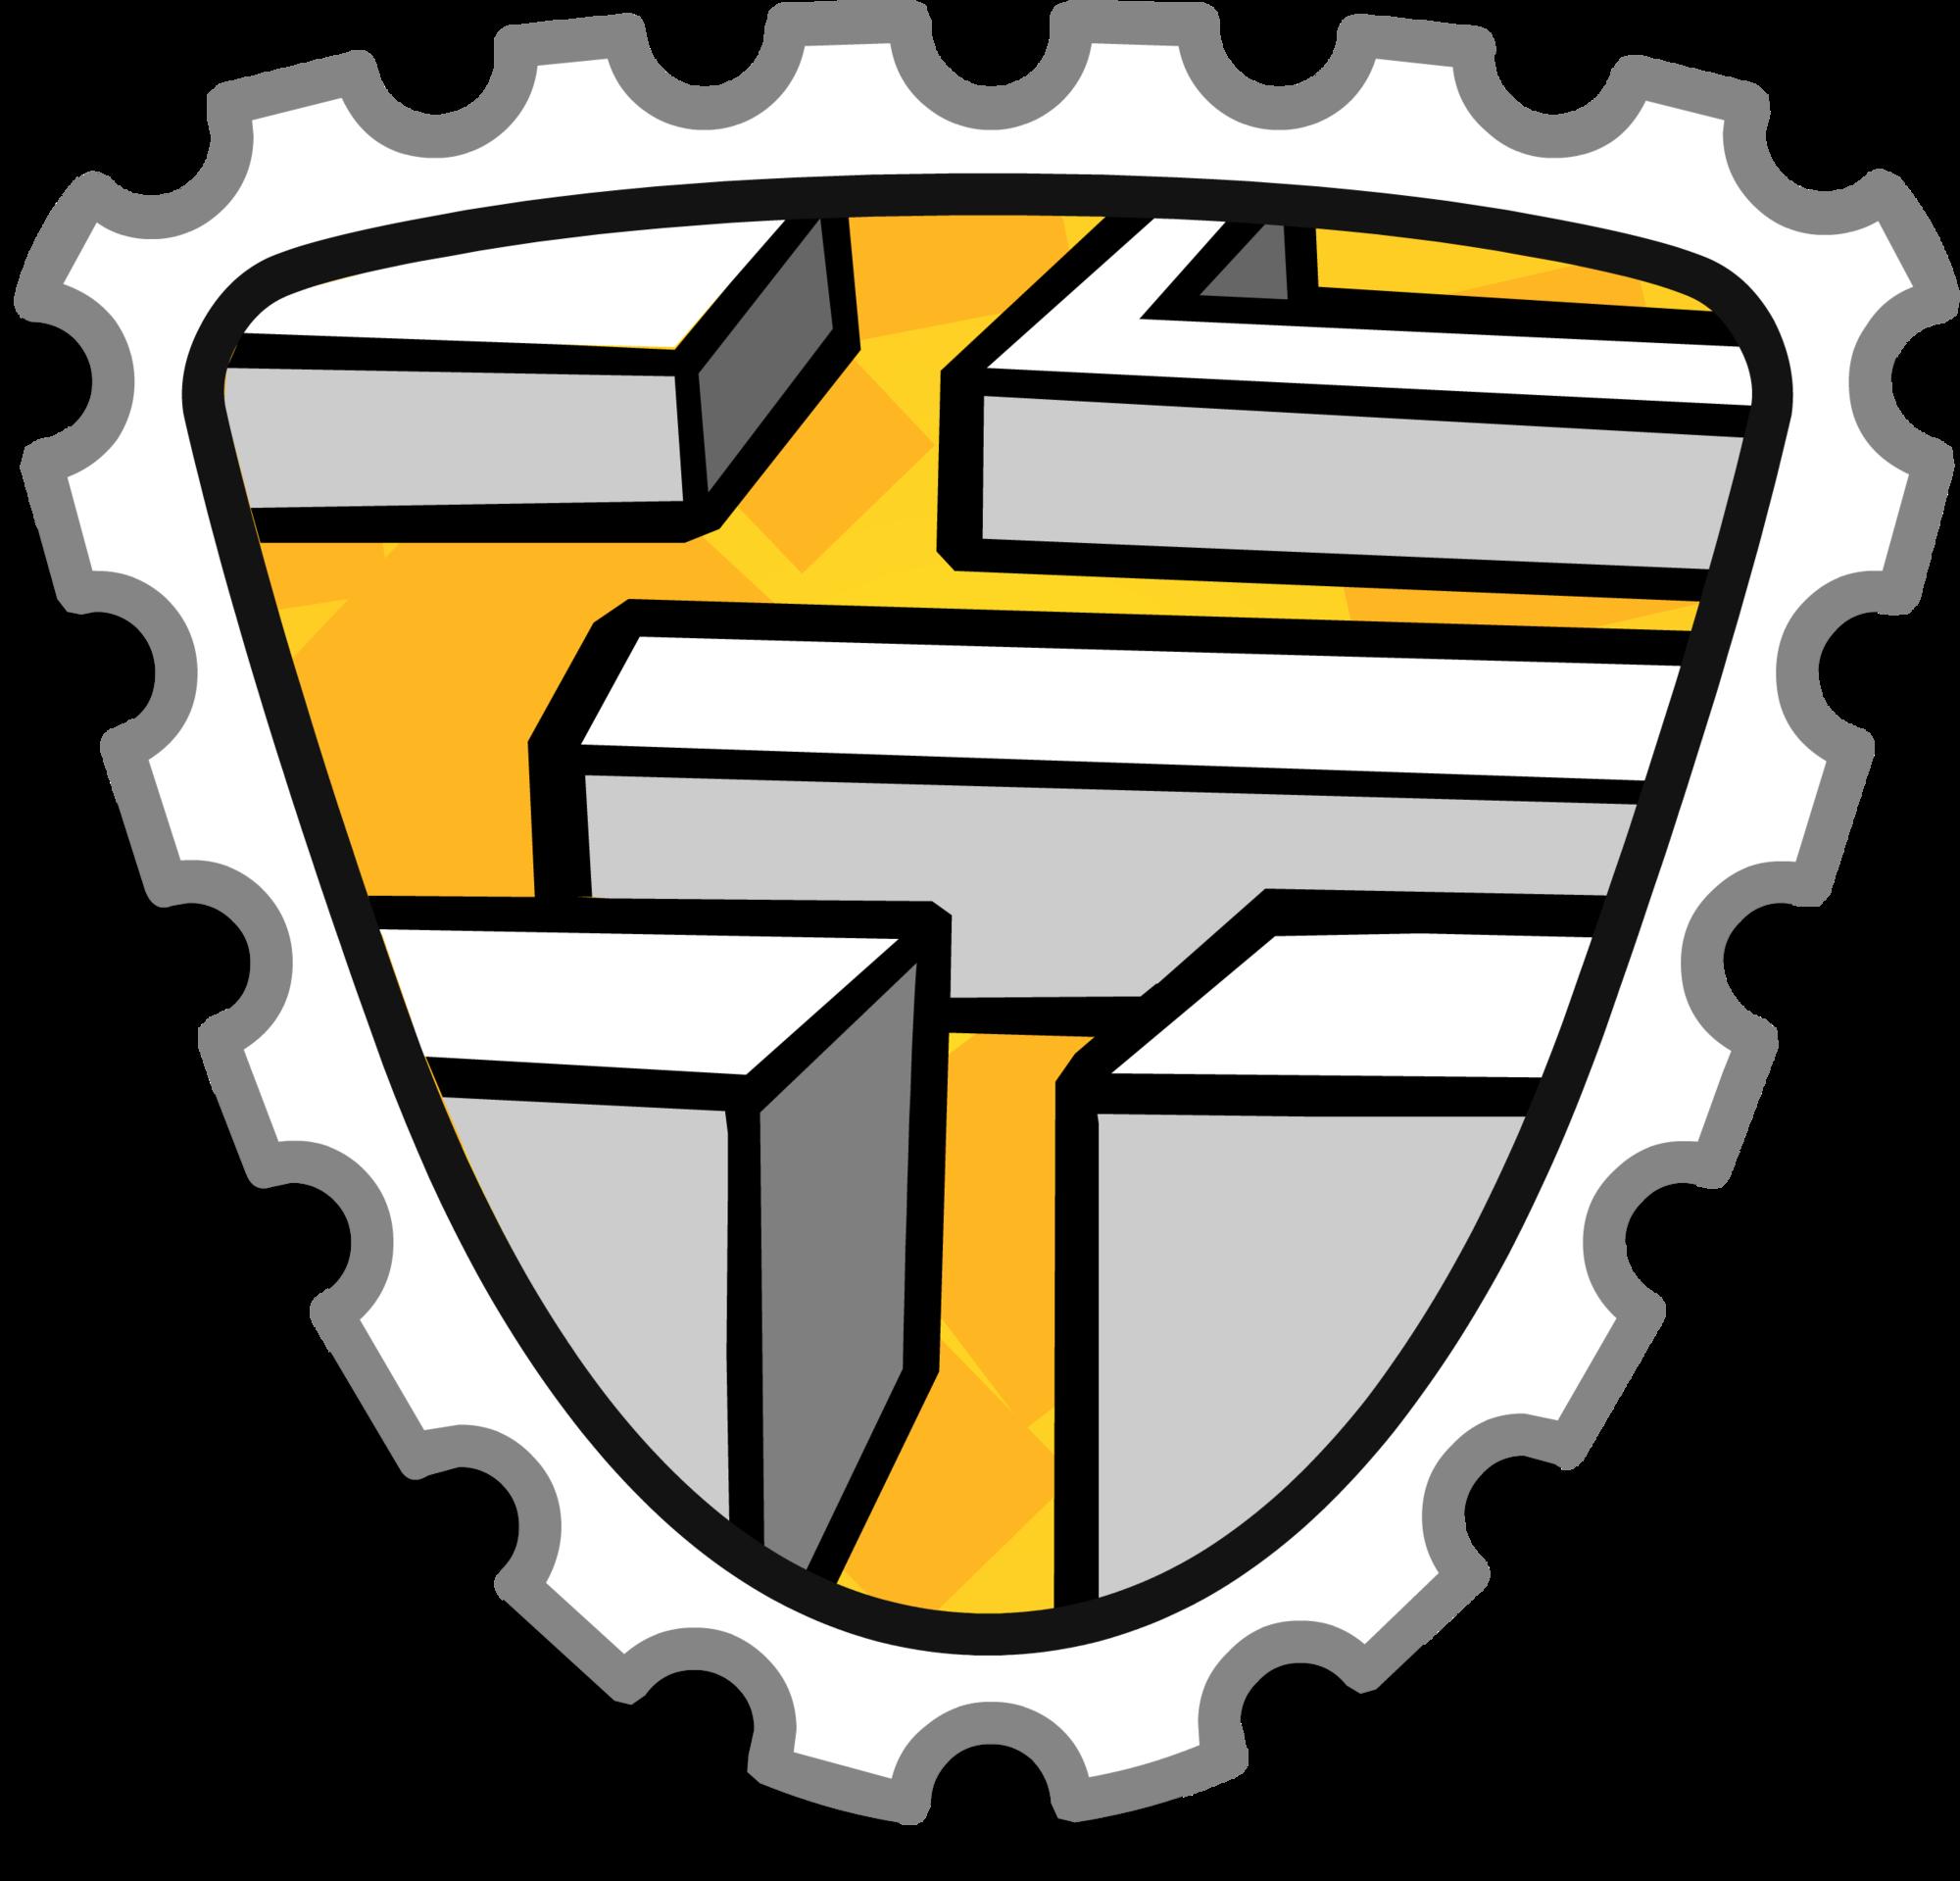 Maze clipart medium difficulty. Path finder stamp club